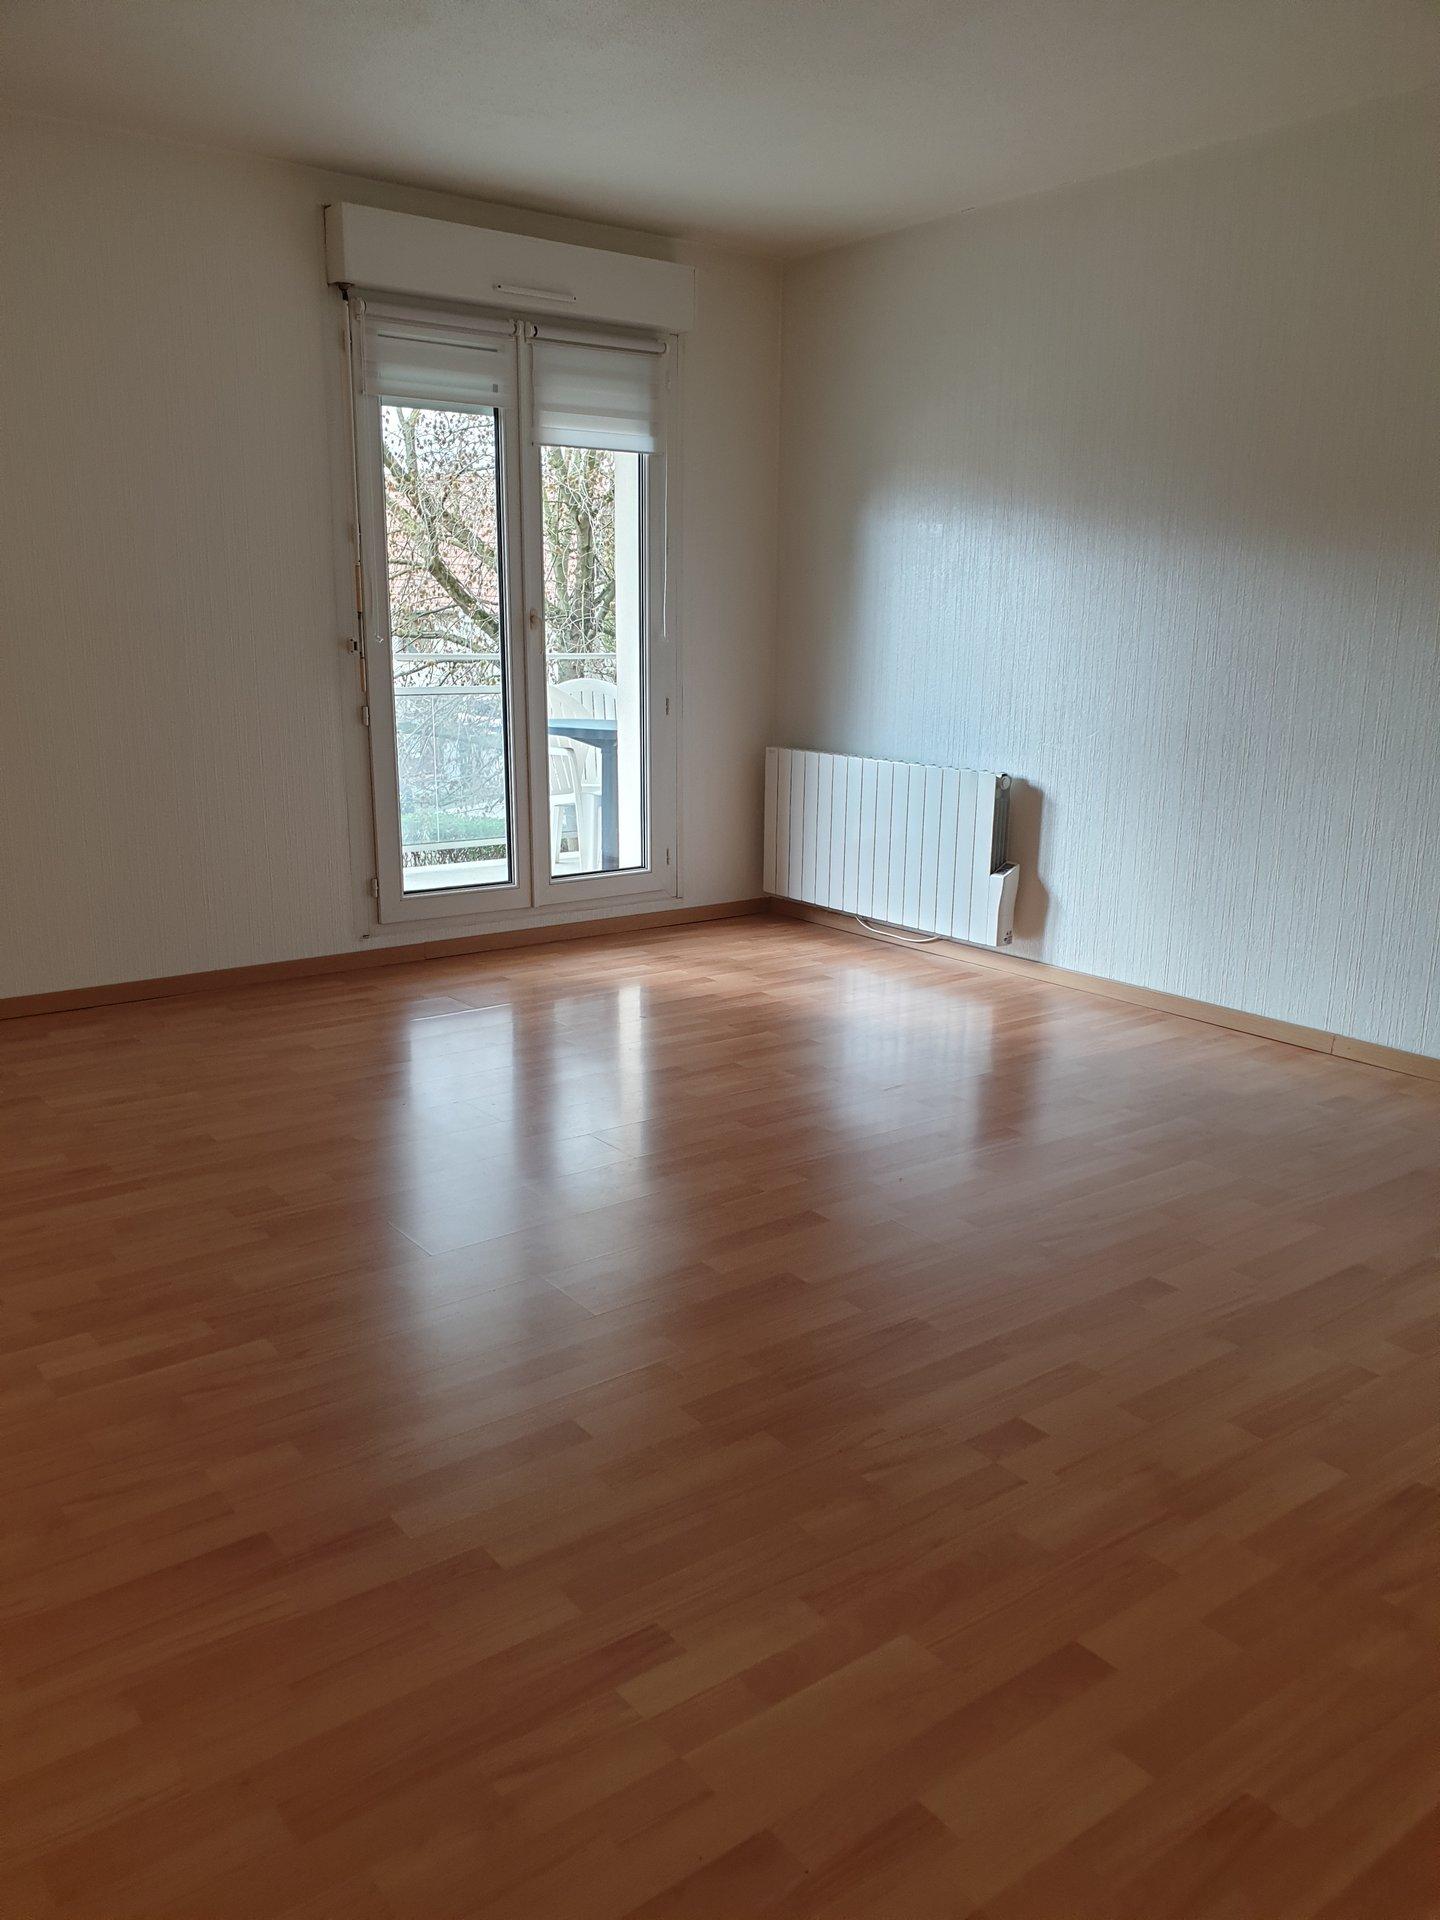 Eckbolsheim : Joli 2 pièces avec balcon !!